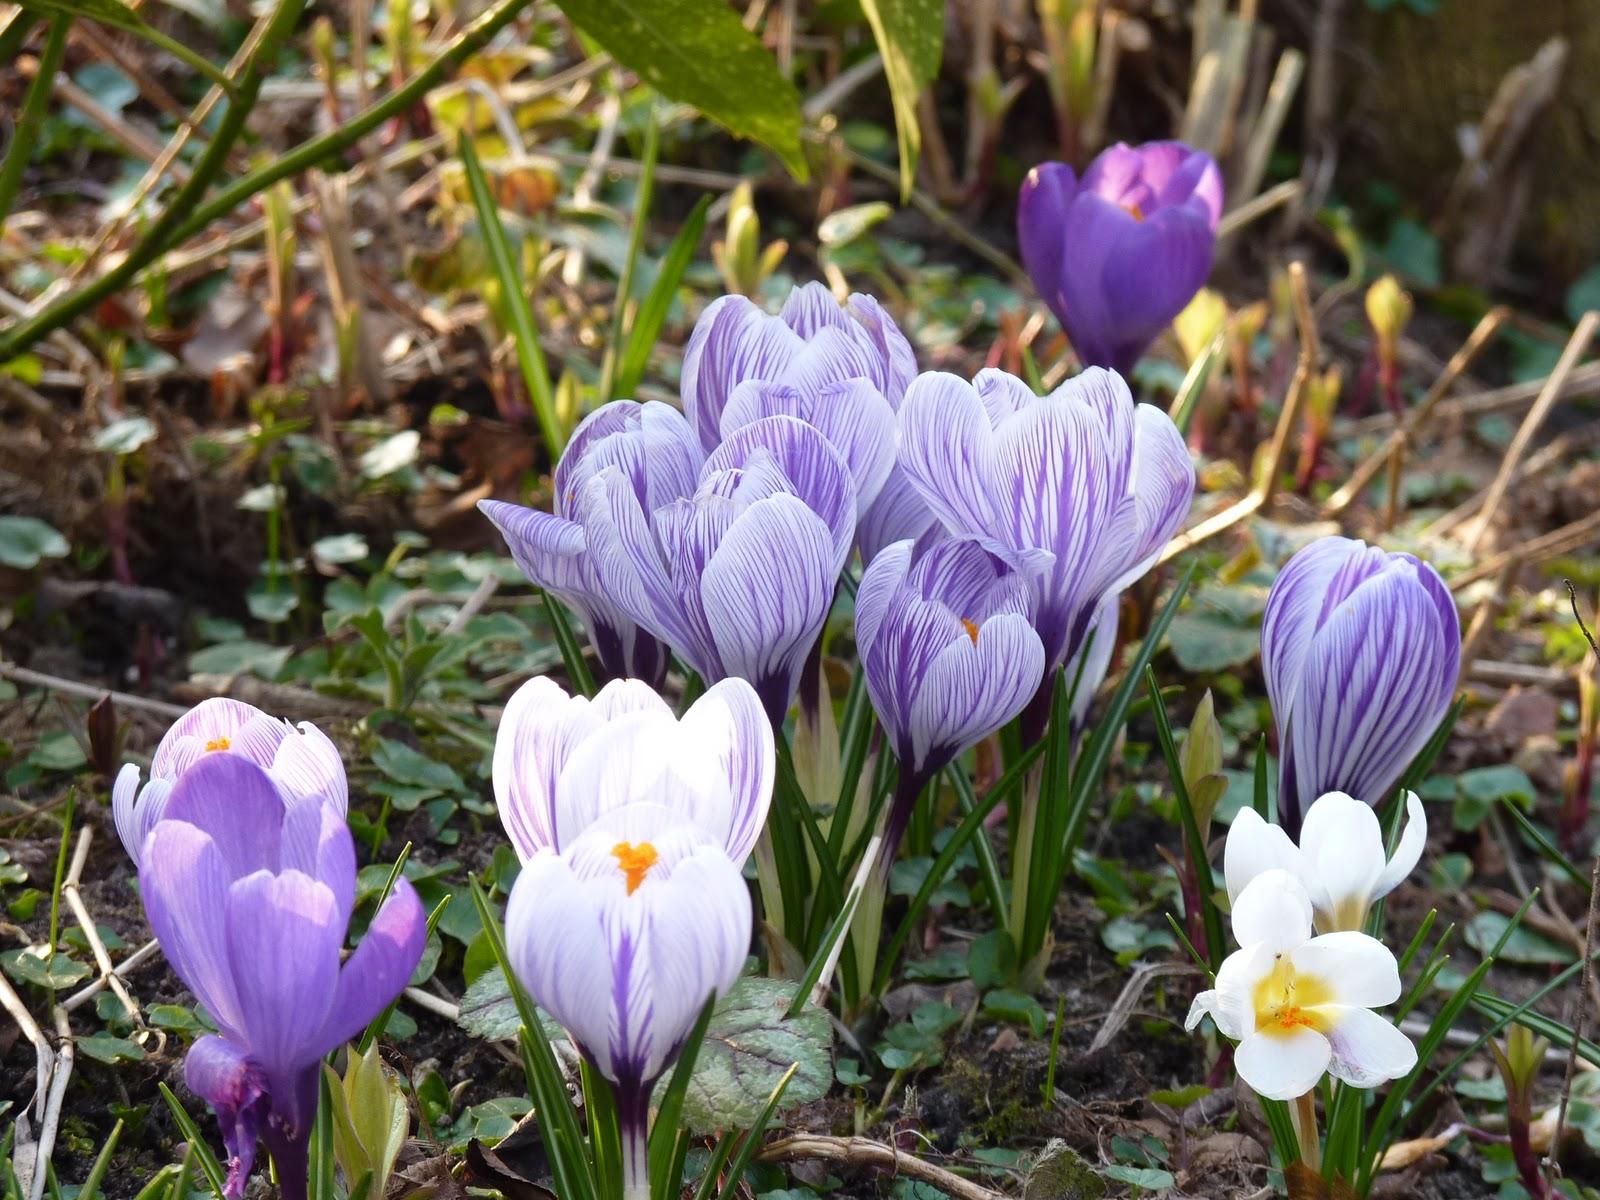 Kevät Luonto